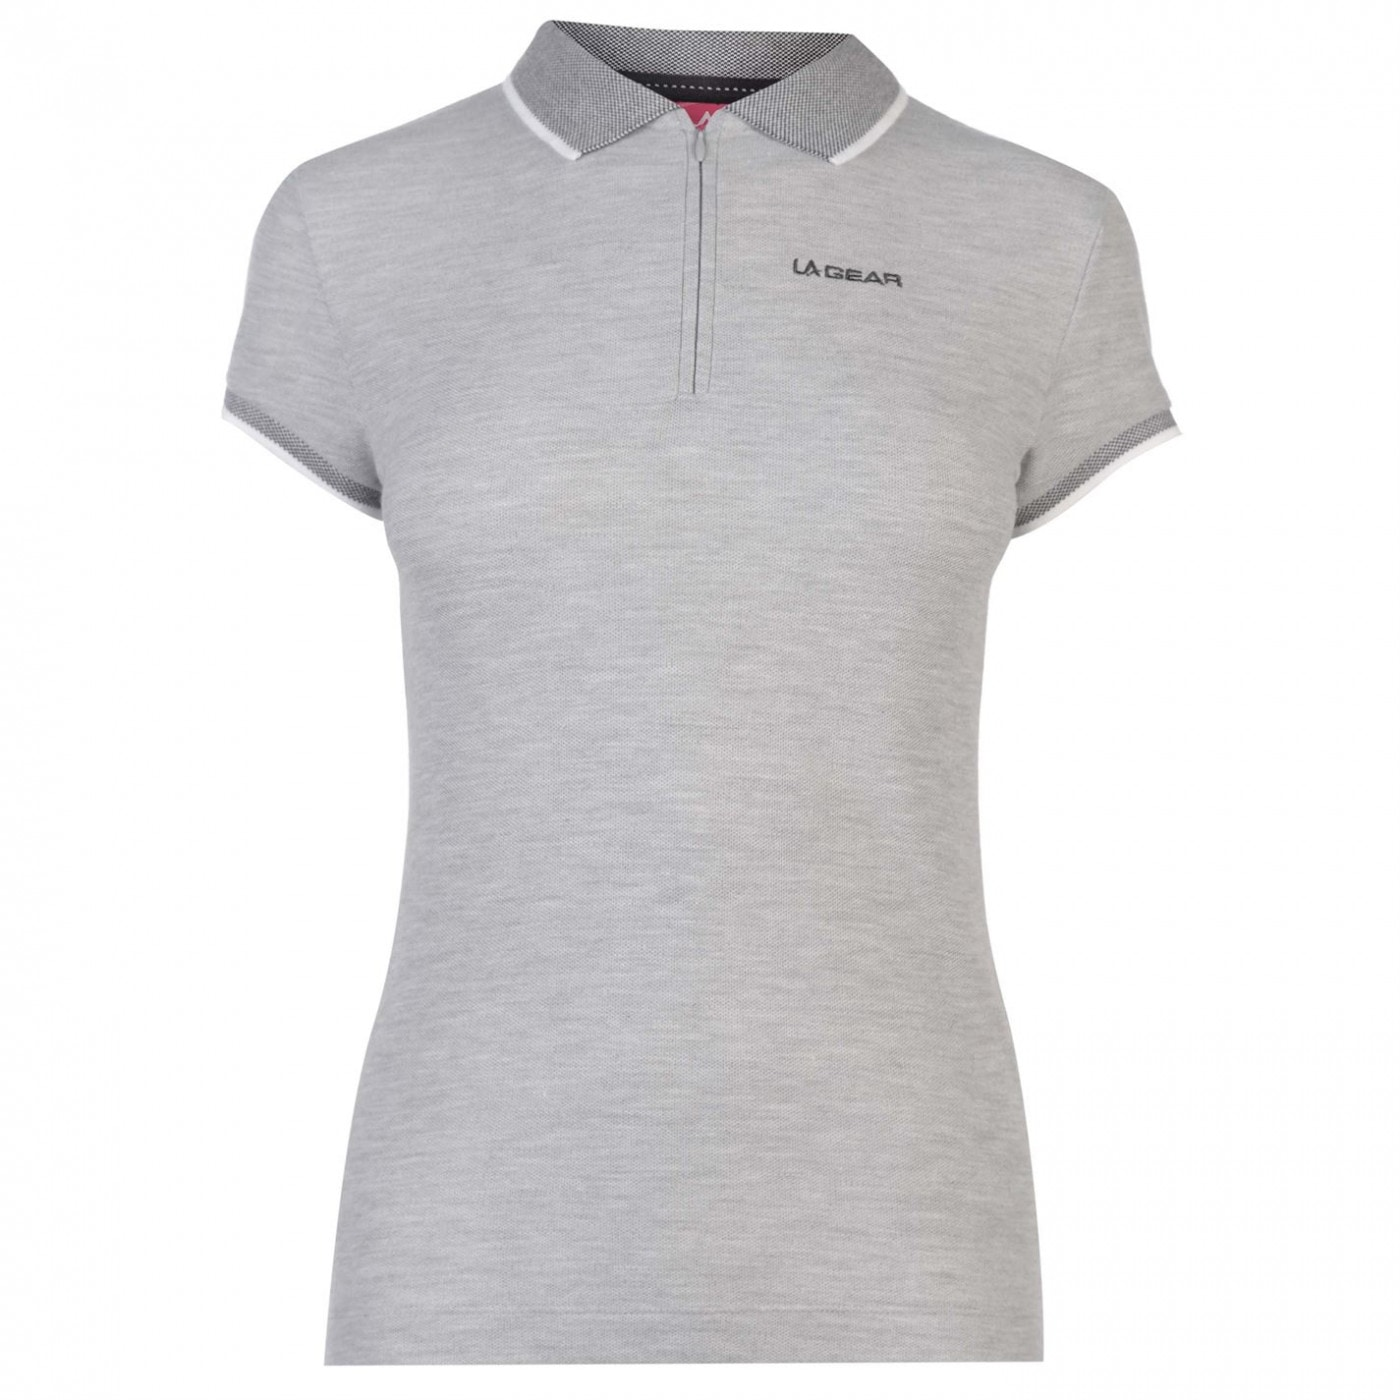 LA Gear Tipped Polo Shirt Ladies